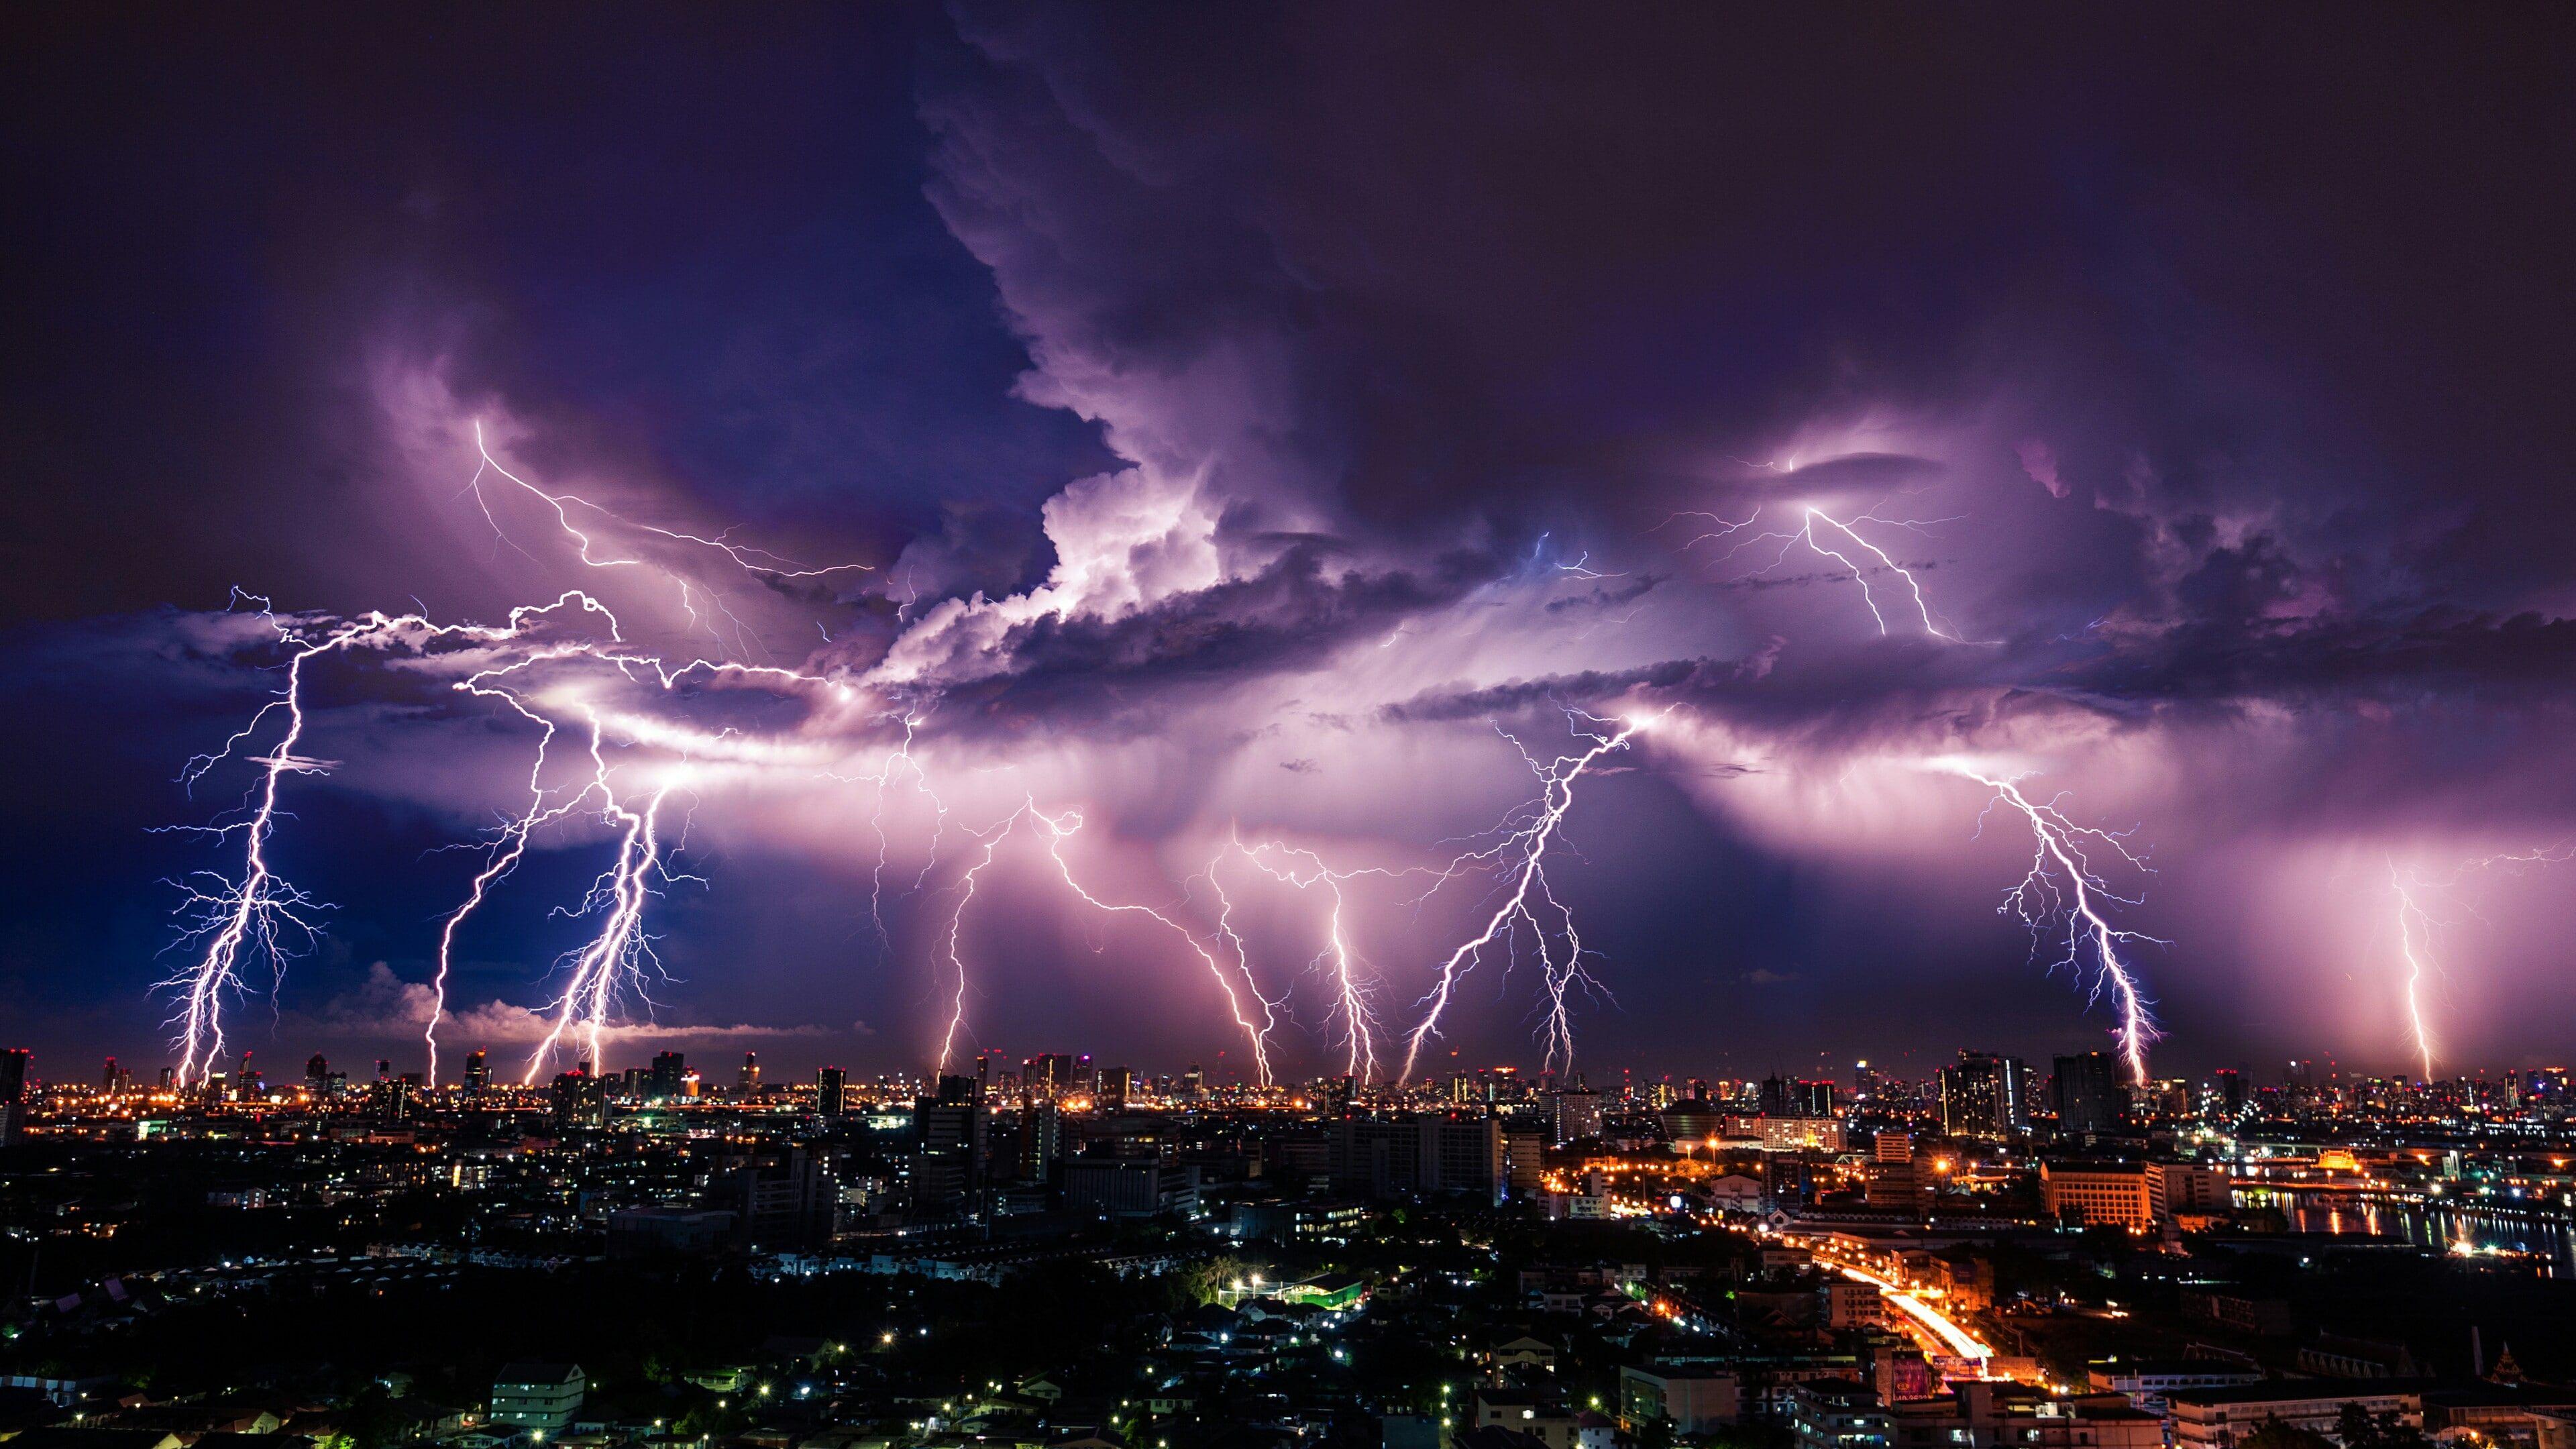 Lightning Sky Thunder City Thunderstorm Night Cloud Cityscape Phenomenon Metropolis Storm Evening 4k Lightning Sky Thunder And Lightning Lightning